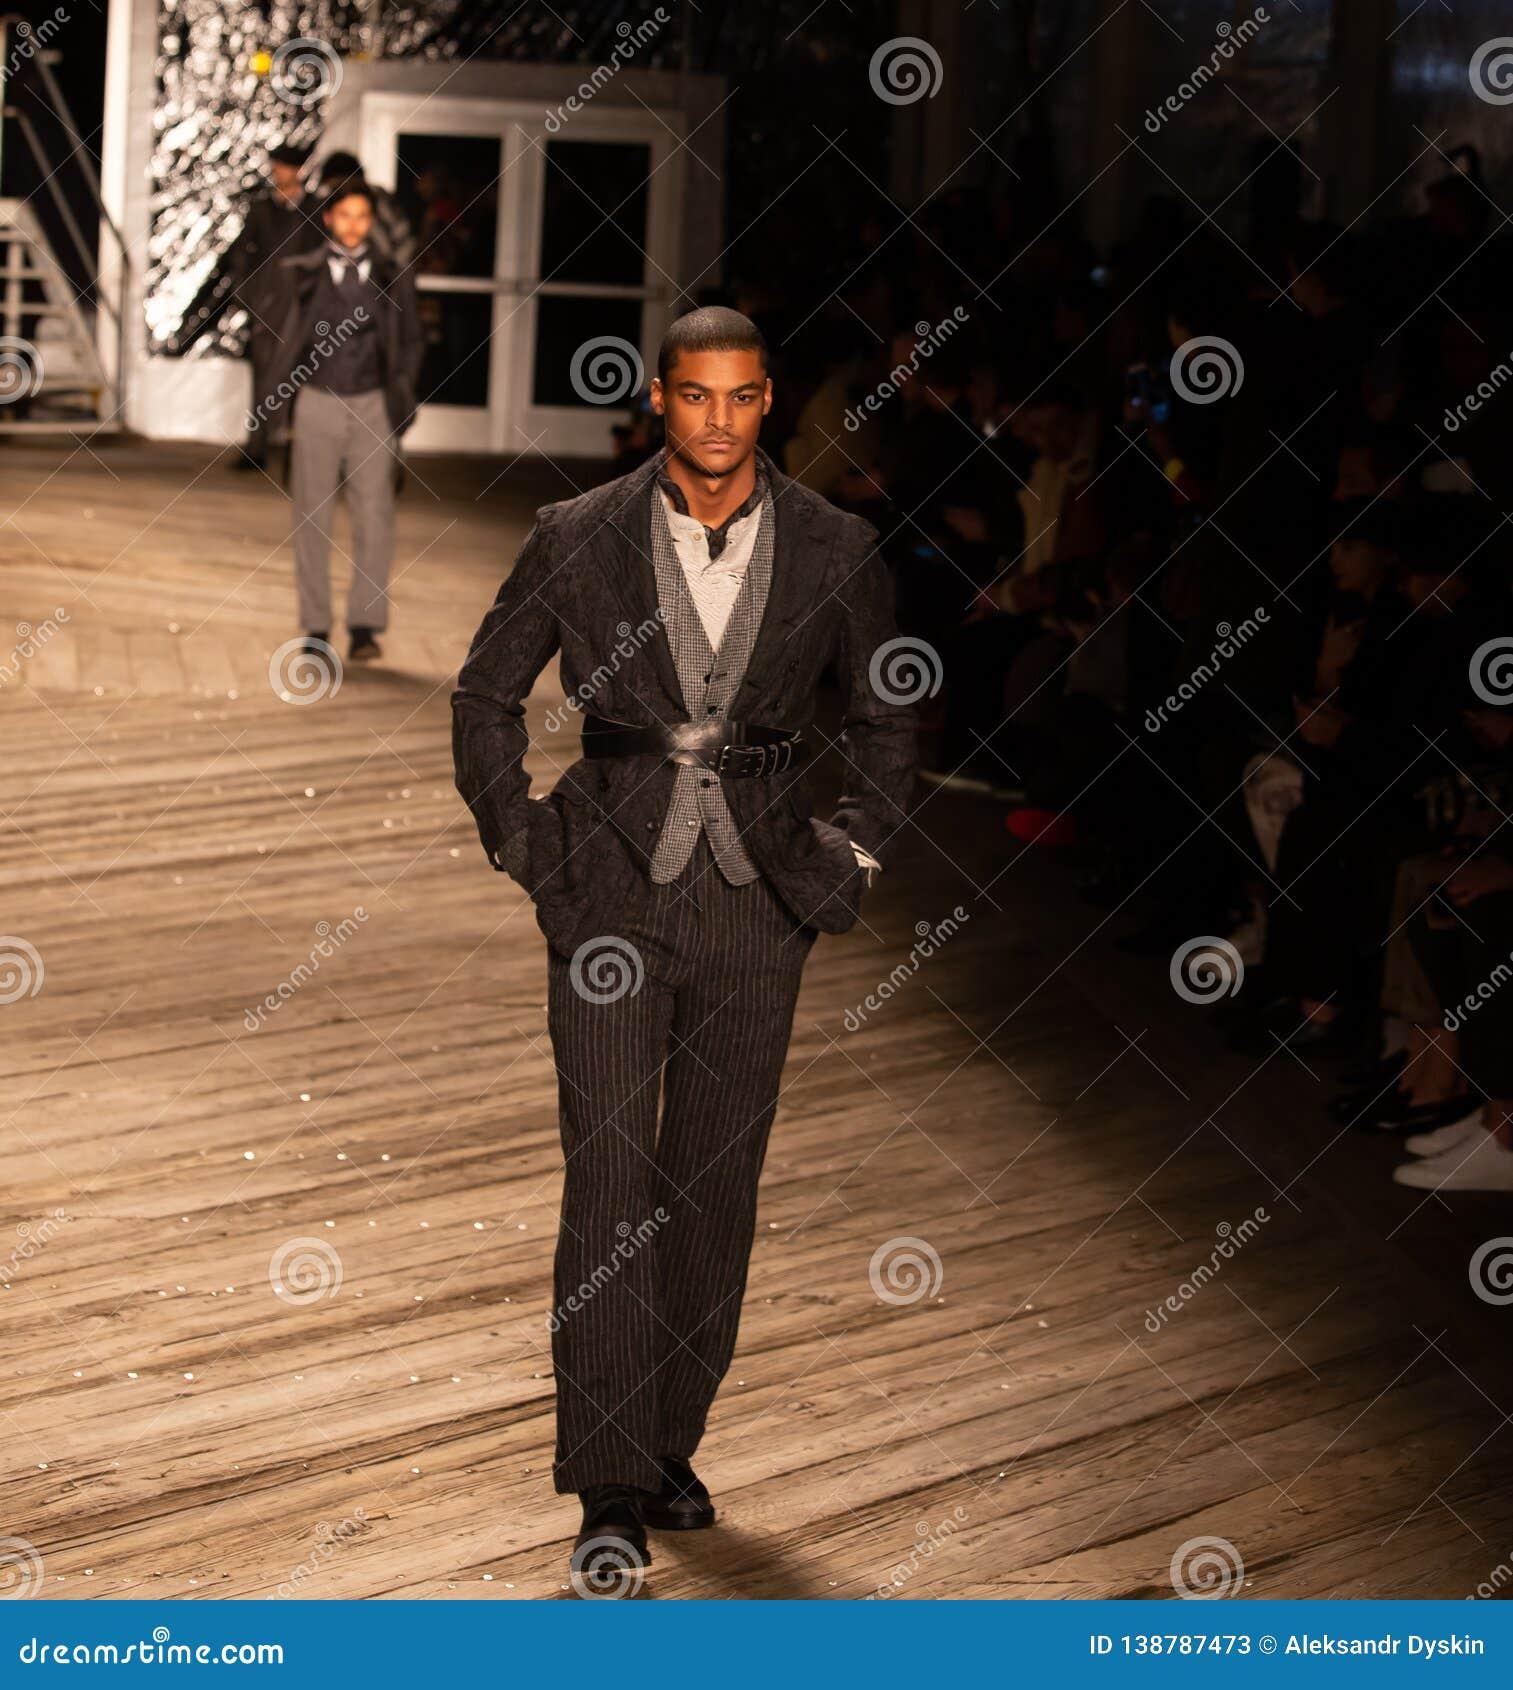 Joseph Abboud Mens Fall 2019 Fashion show as part of New York Fashion Week